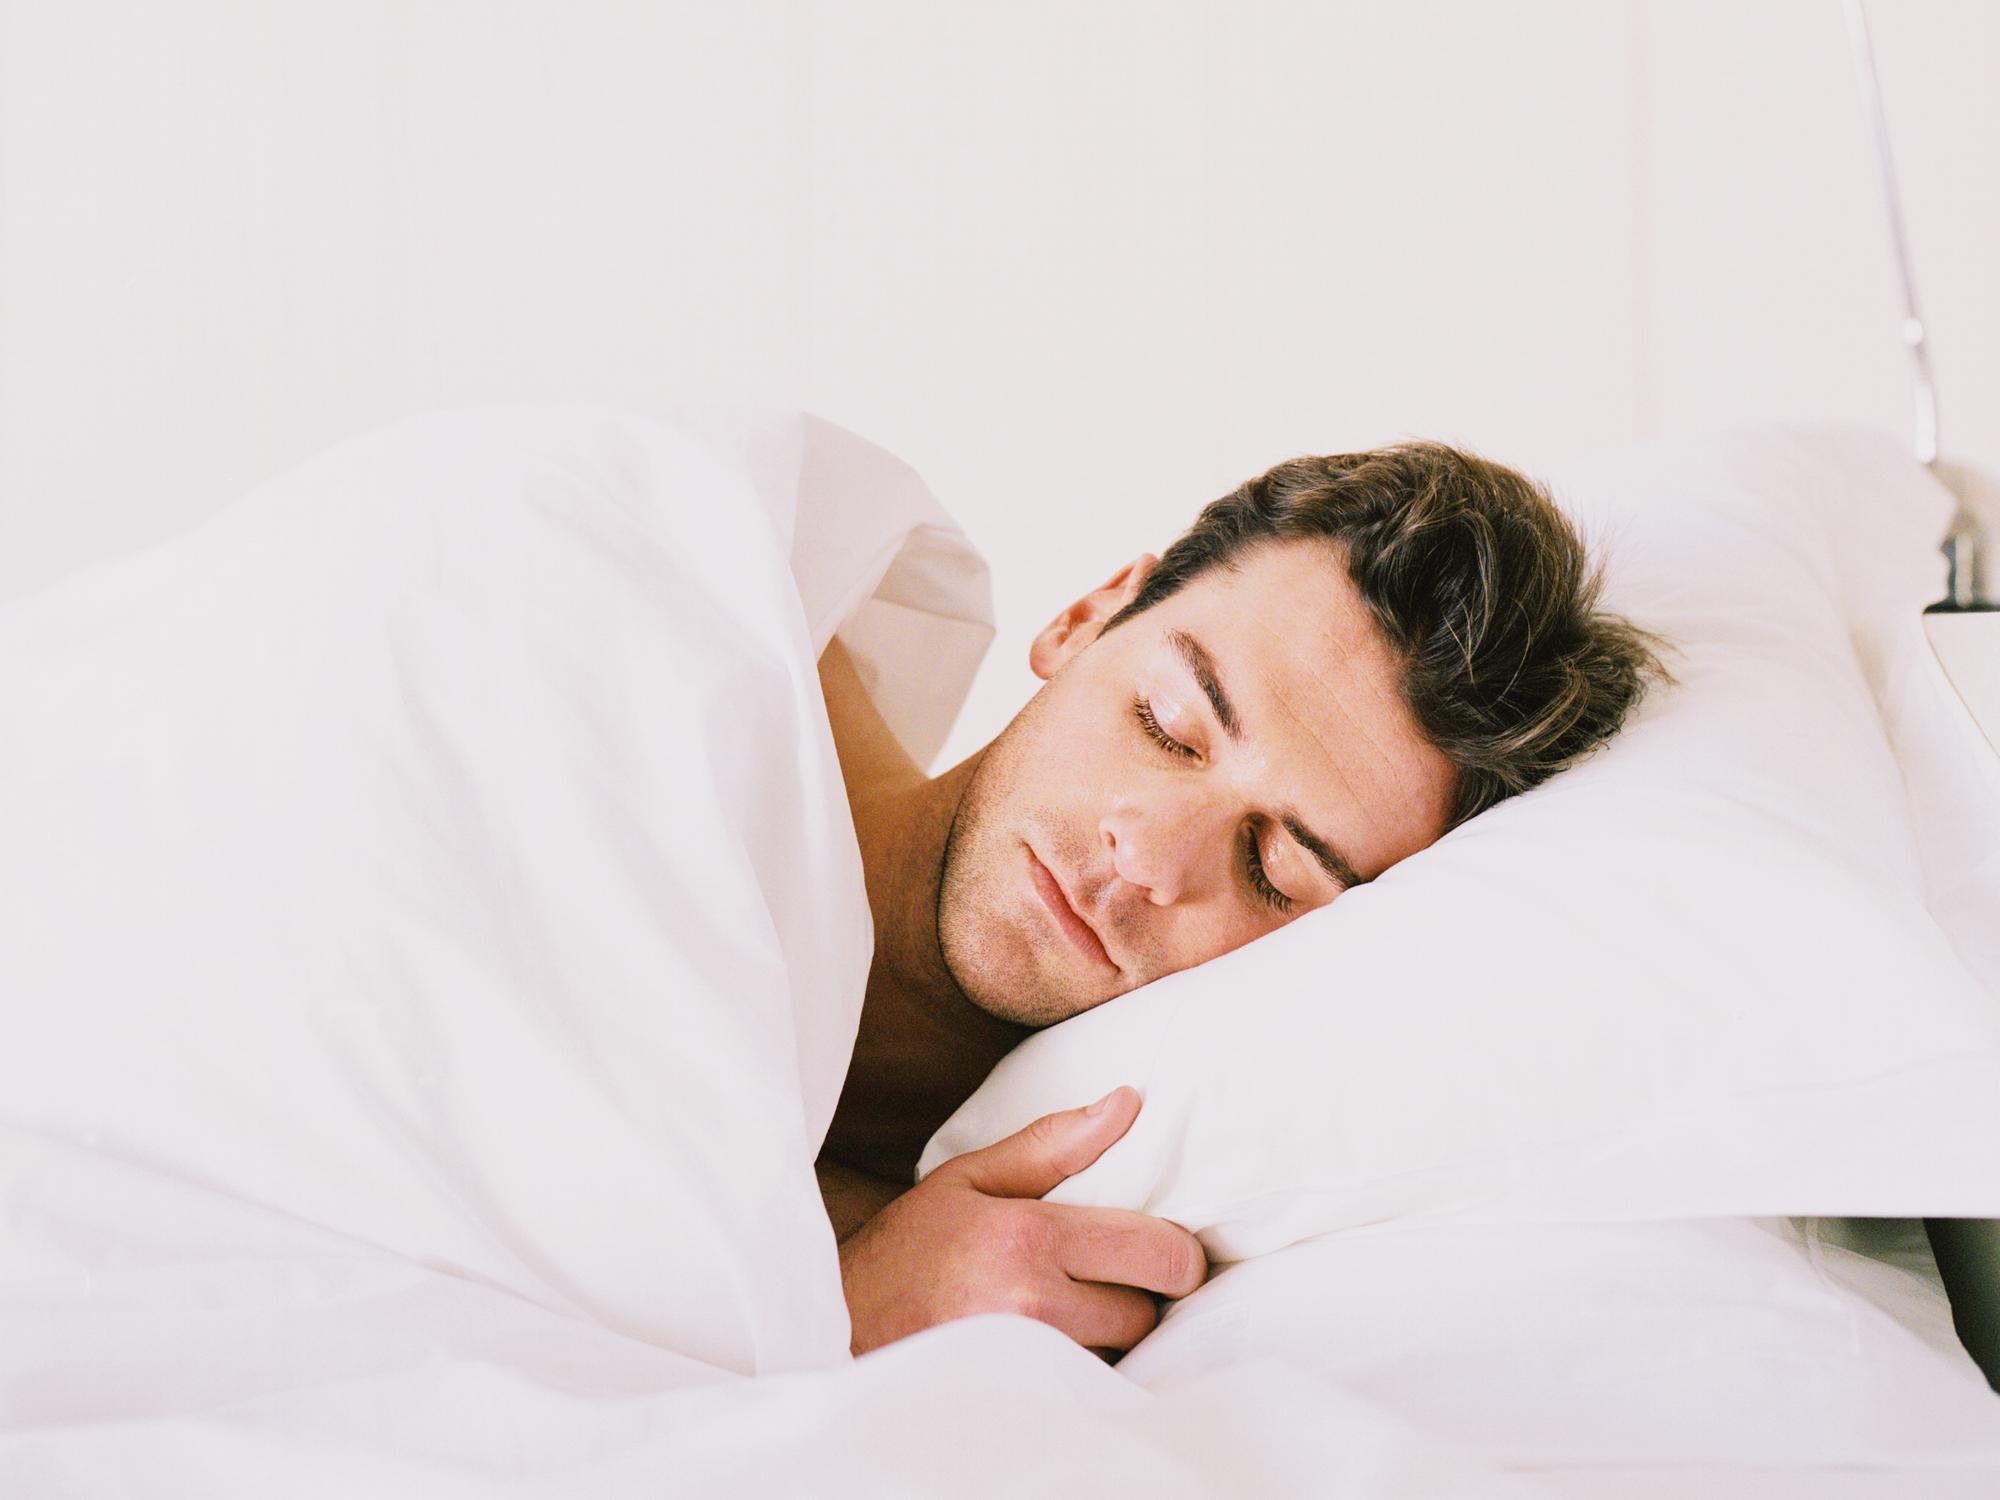 How to sleep to avoid disease